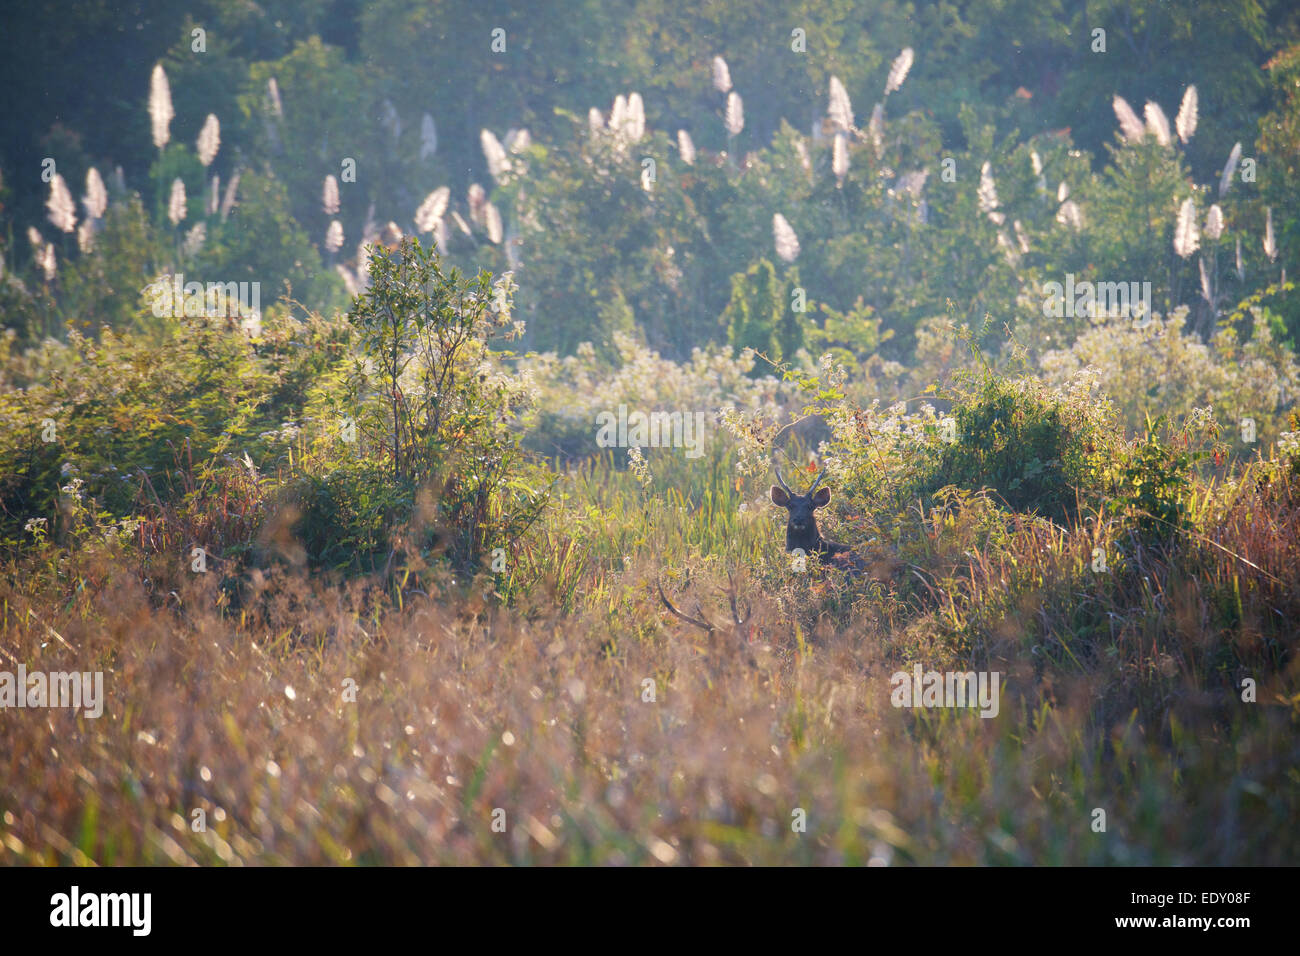 Rusa unicolor, Sambar Deer, in Phu Khieo Wildlife Sanctuary, Thailand. - Stock Image